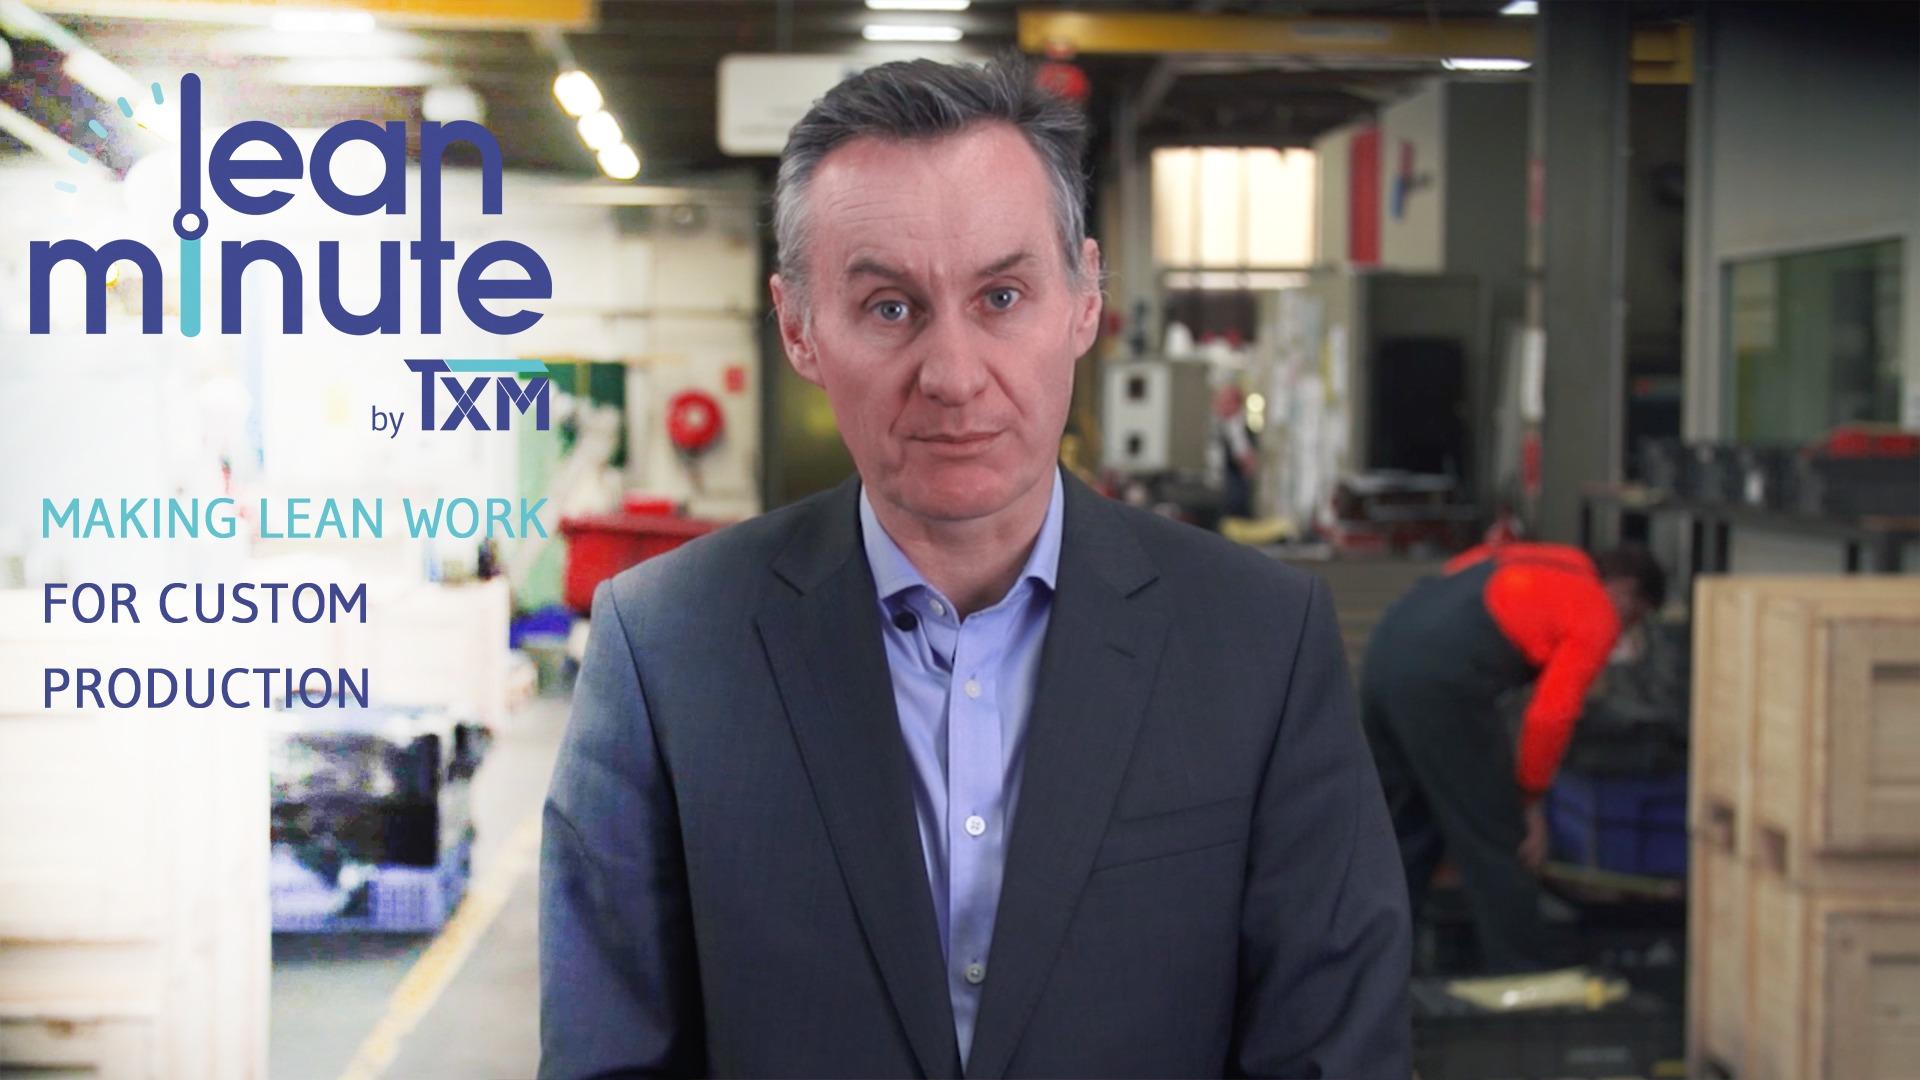 TXM Lean Minute – Making Lean Work In a Jobbing Shop